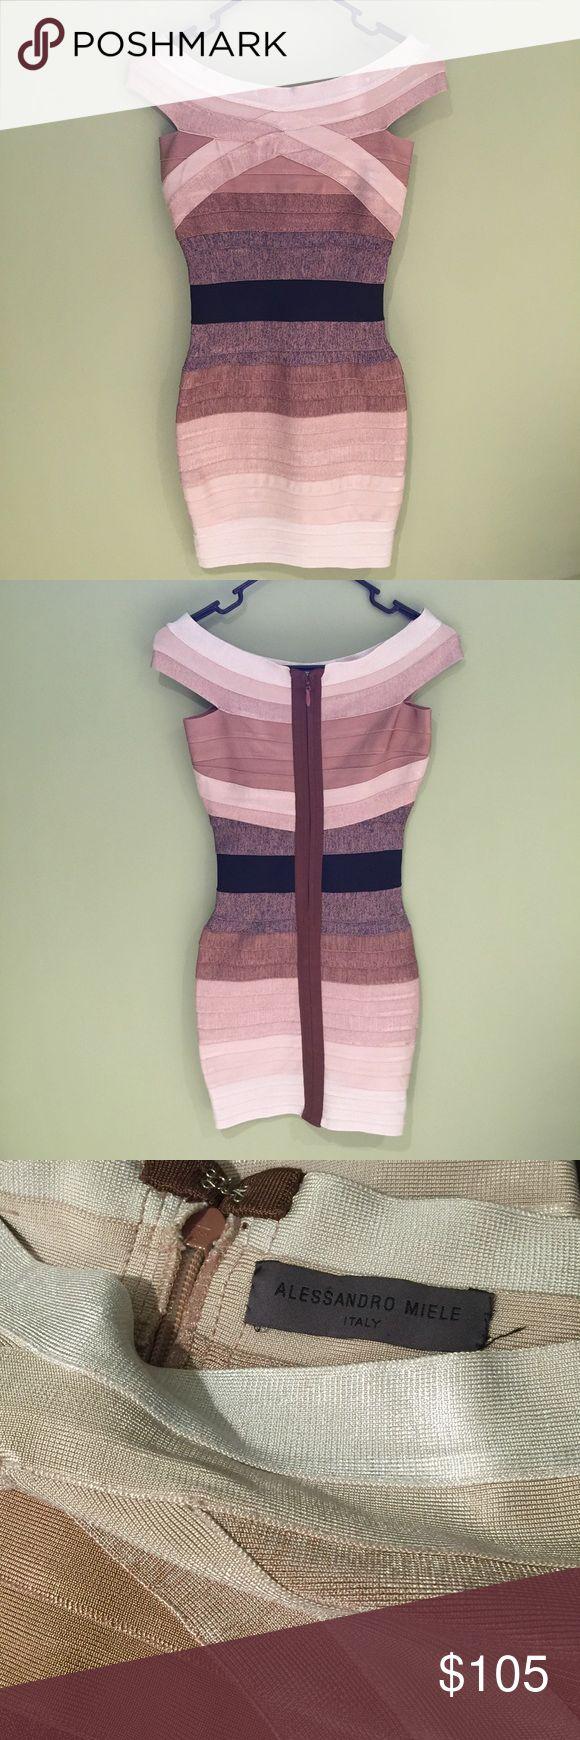 Alessandro Miele Bandage striped dress Alessandro Miele made in Italy 🇮🇹 bandage bodycon dress with zipper back Alessandro Miele Italy  Dresses Mini